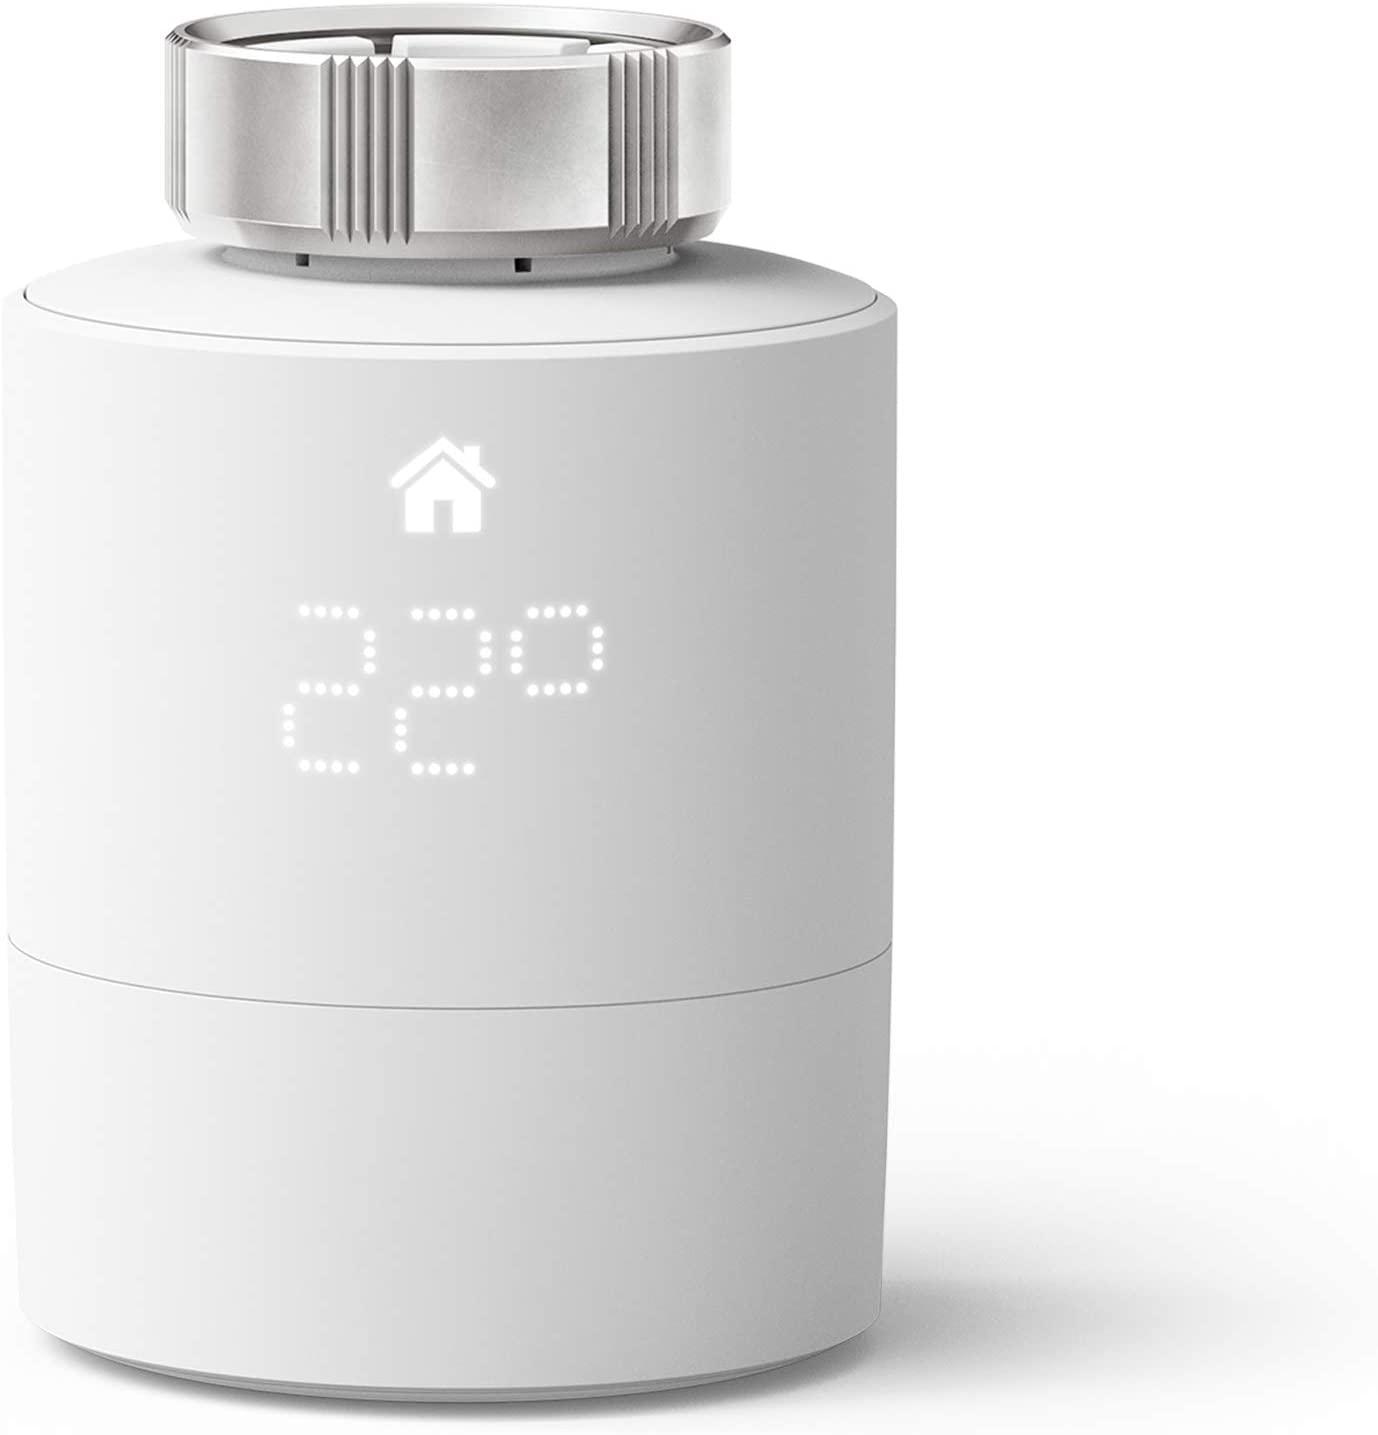 Mejores termostatos inteligentes cabezal tadoº